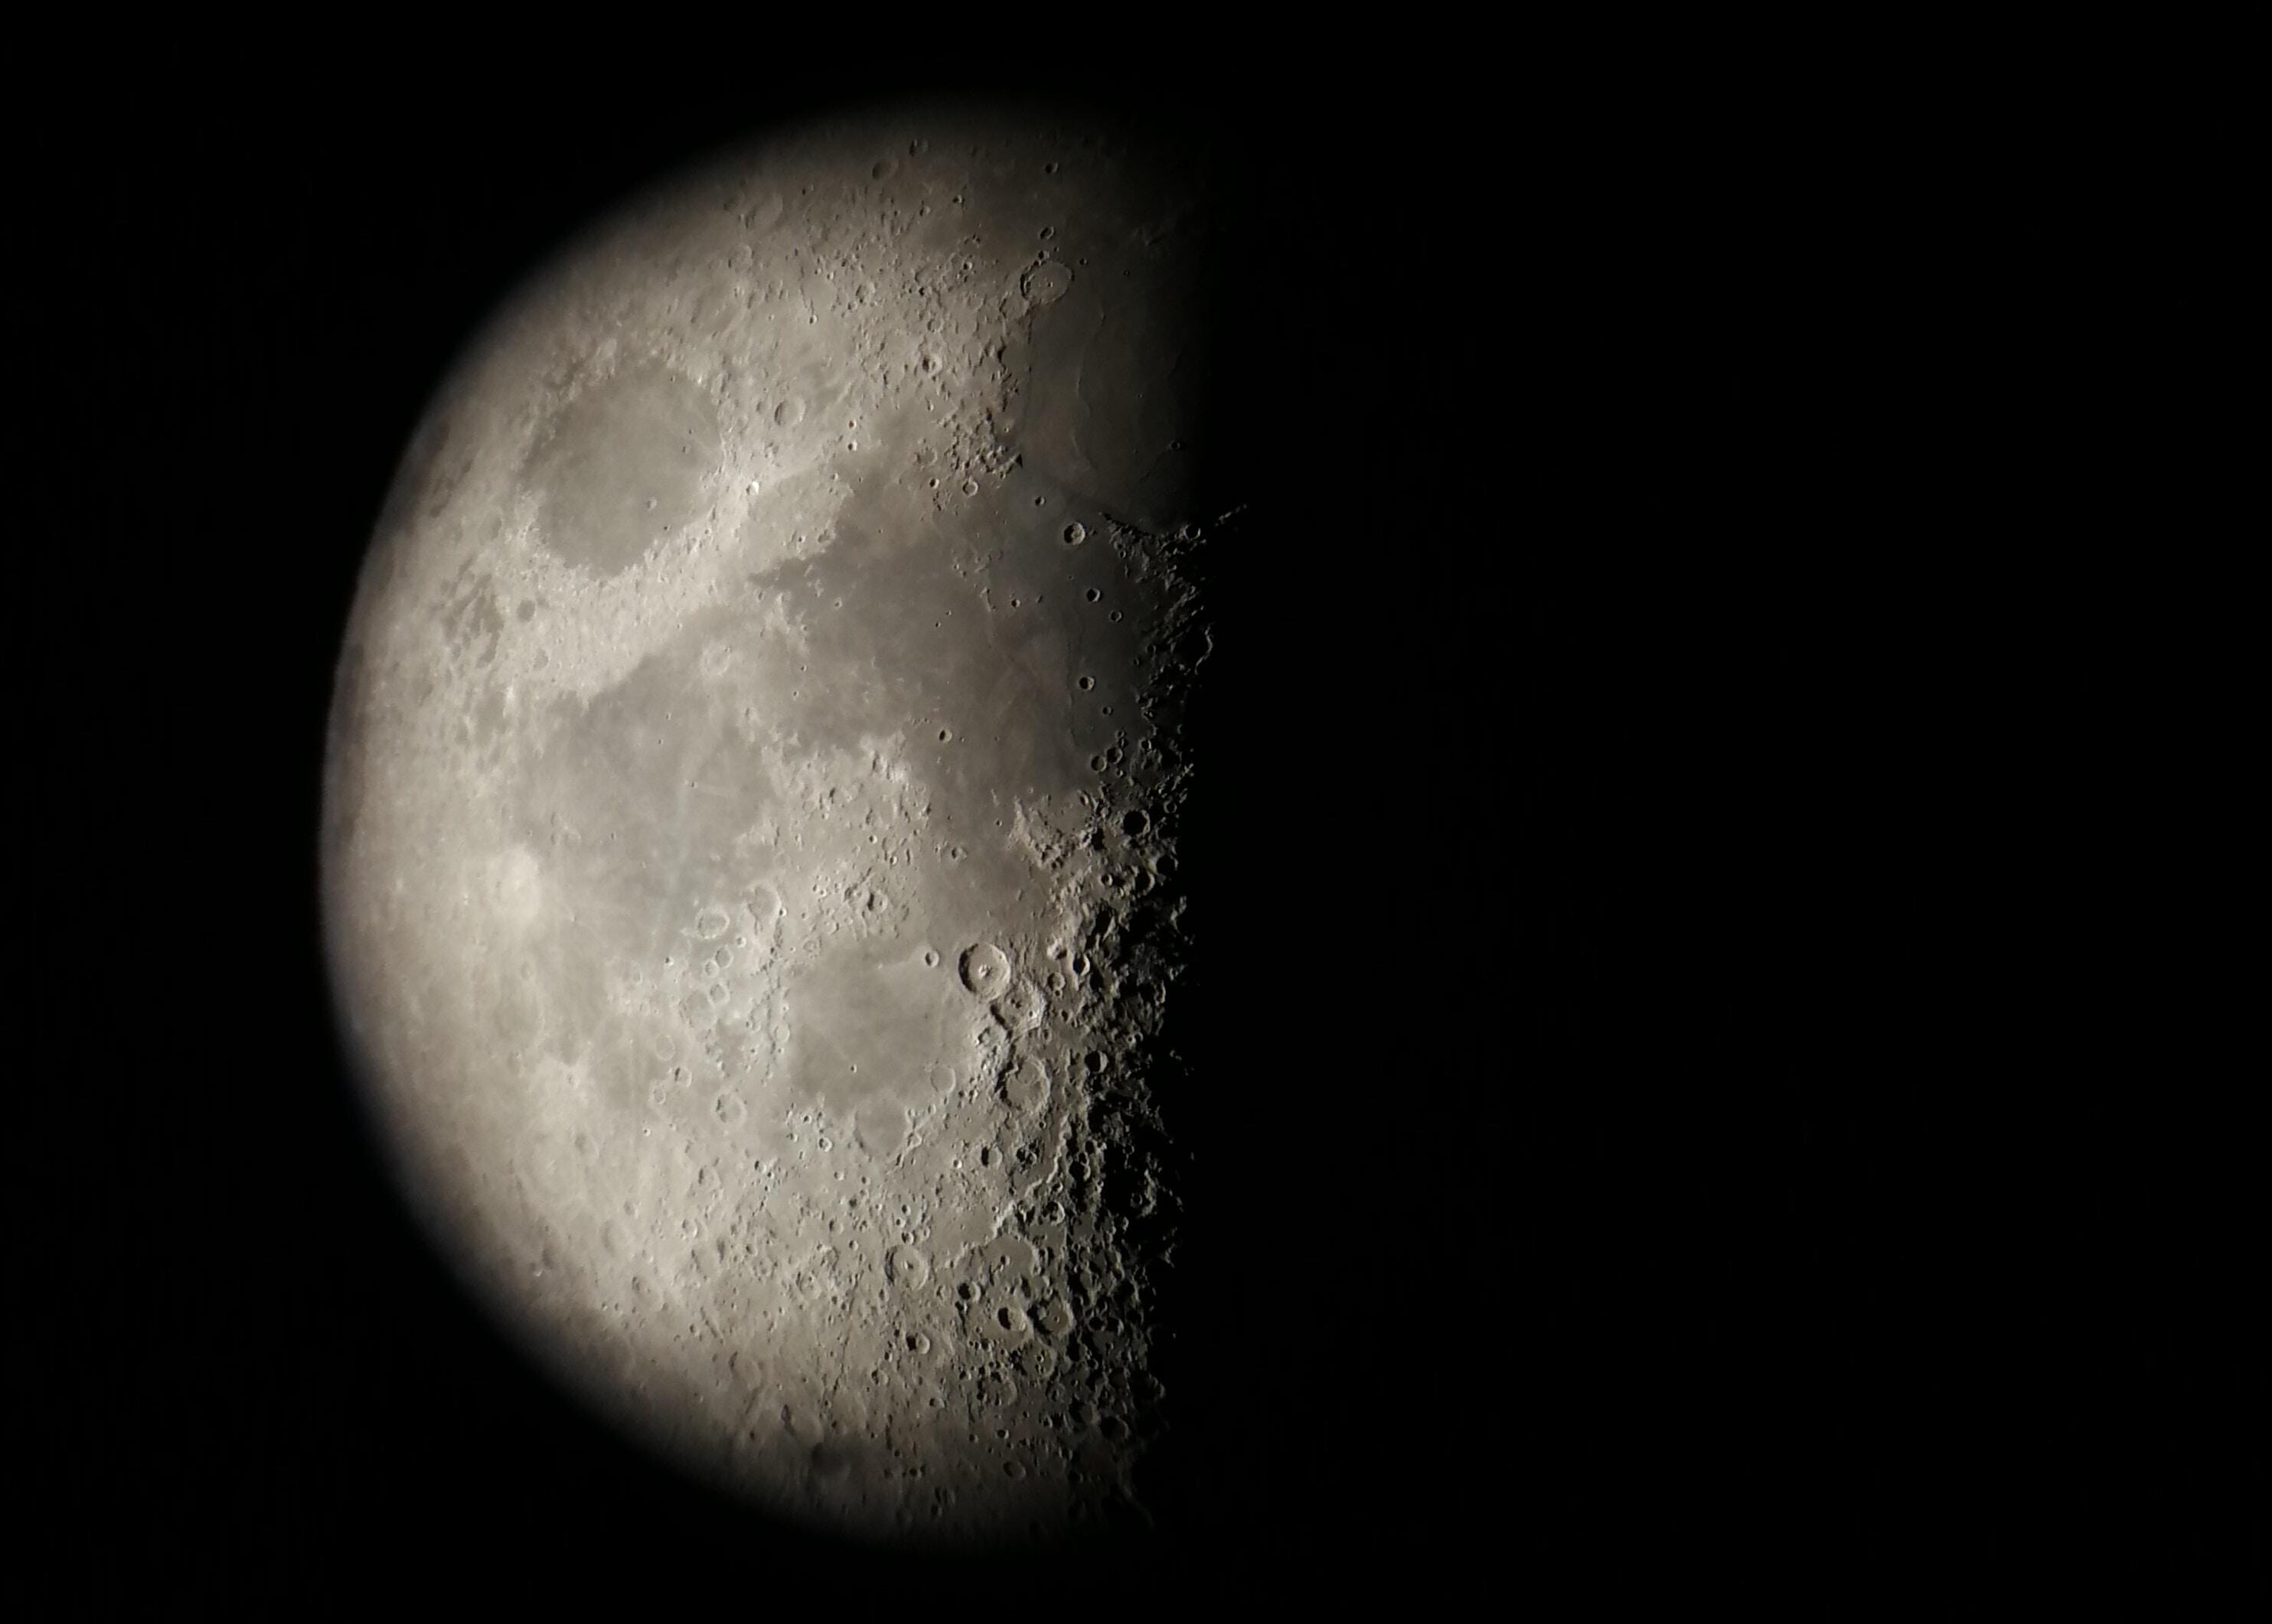 half-moon illustration